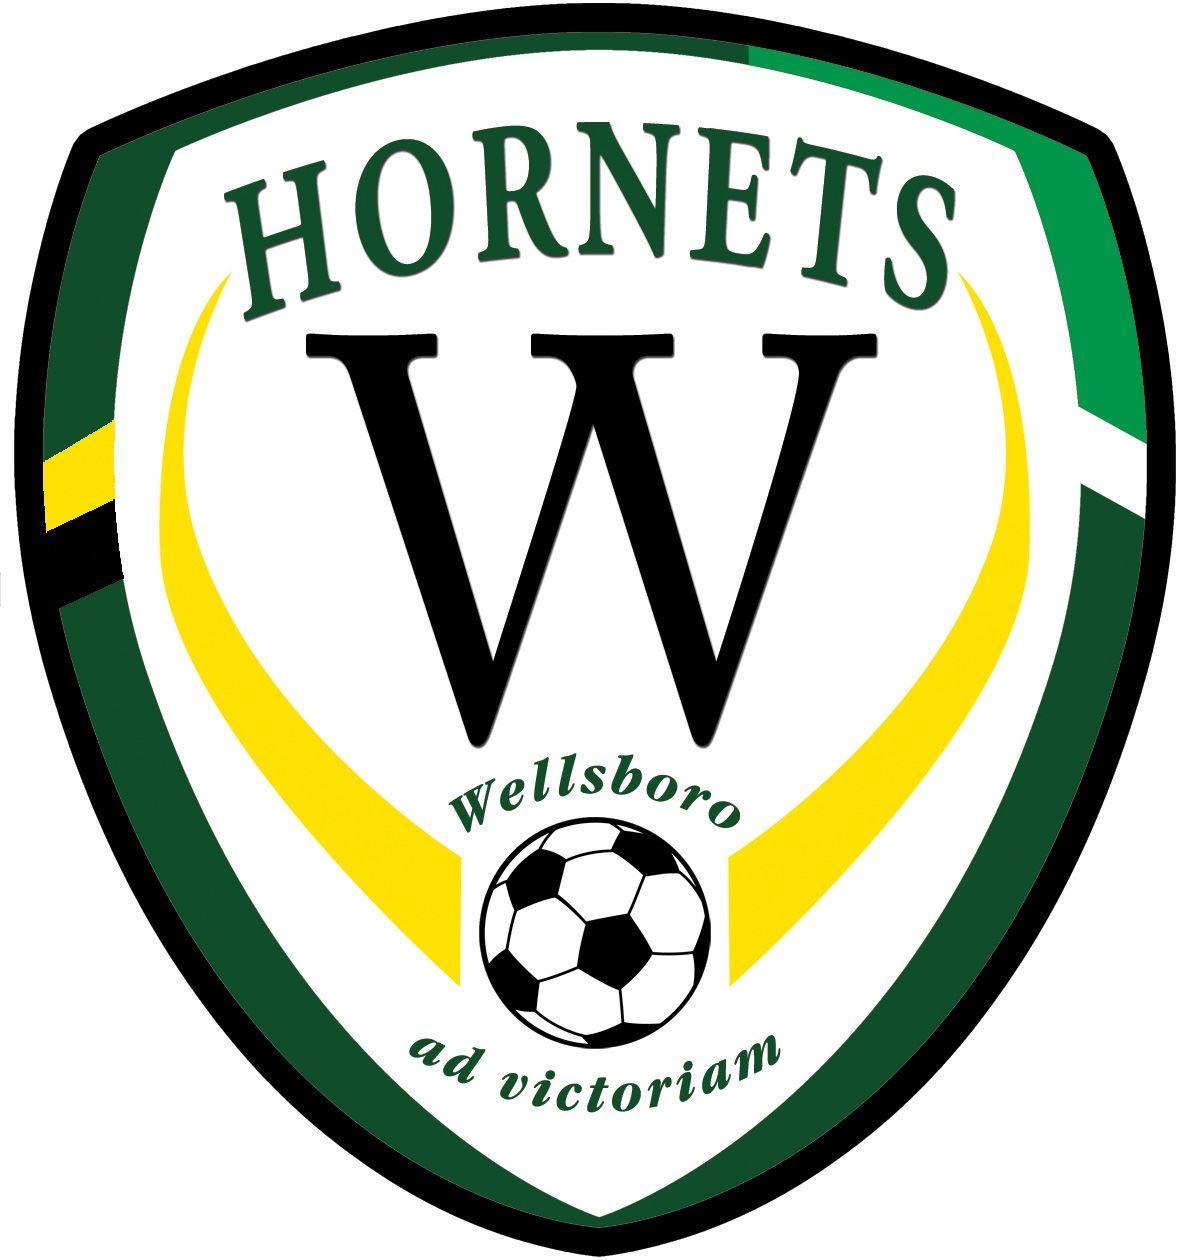 Wellsboro High School - Wellsboro Hornets